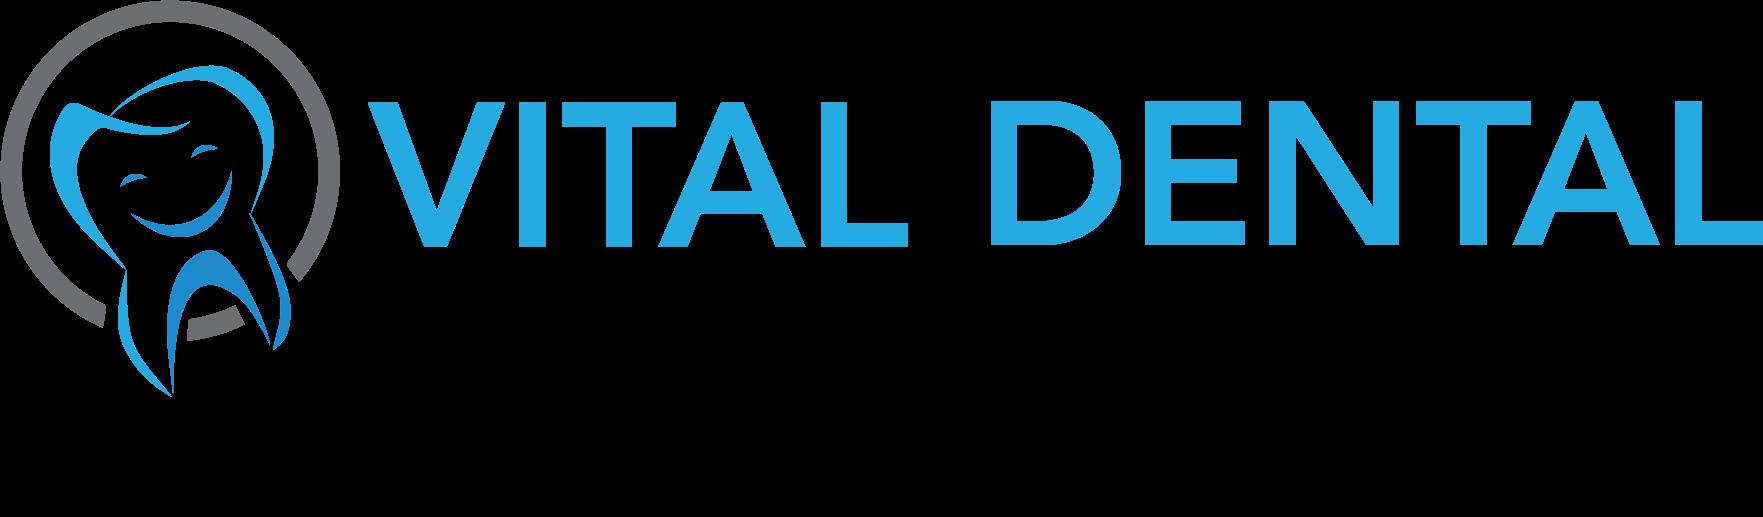 logo for Vital Dental-Randwick Dentists